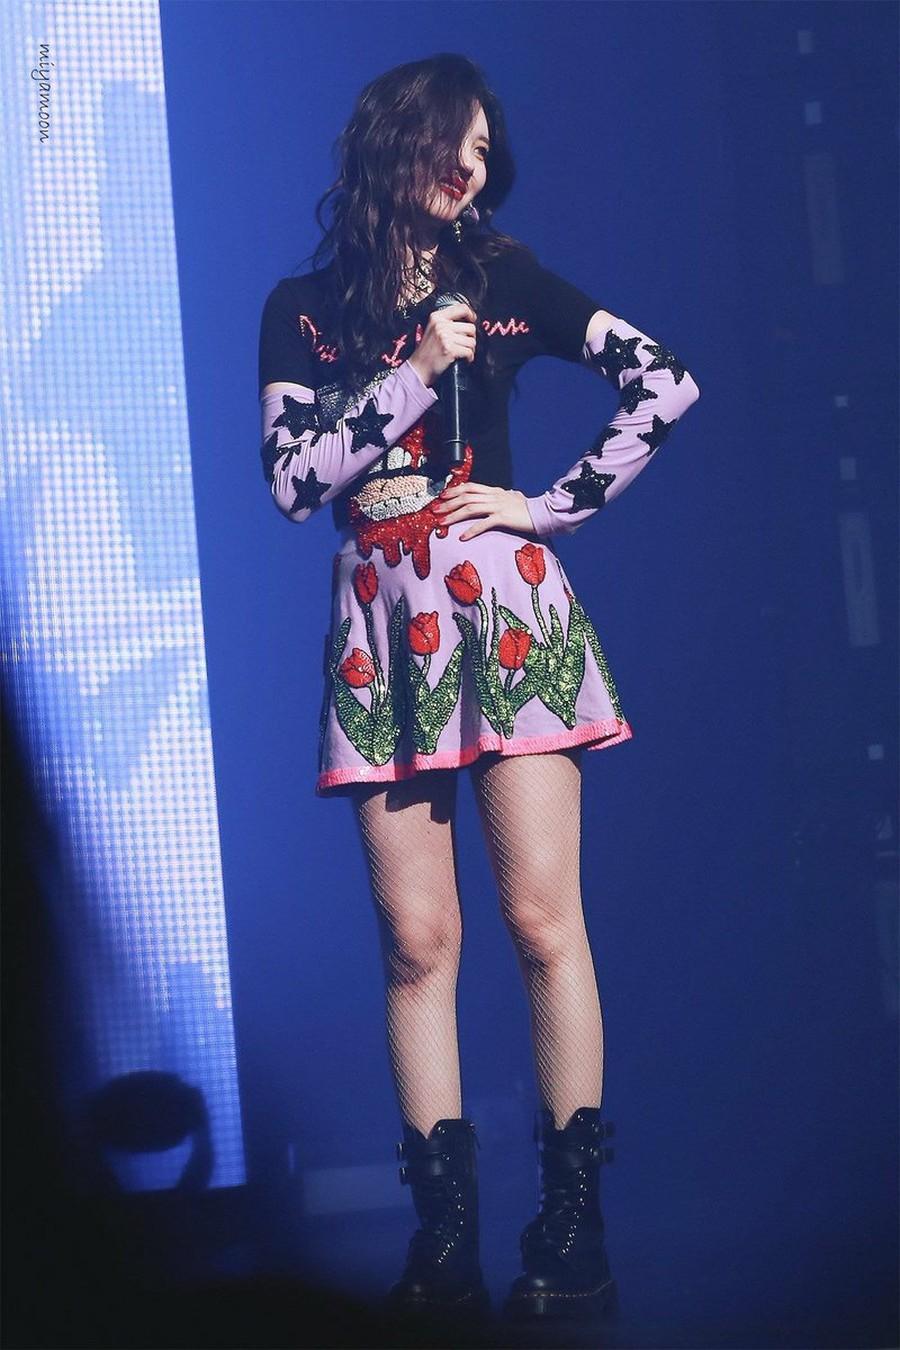 Wonder Girls former member Sunmi rushed to